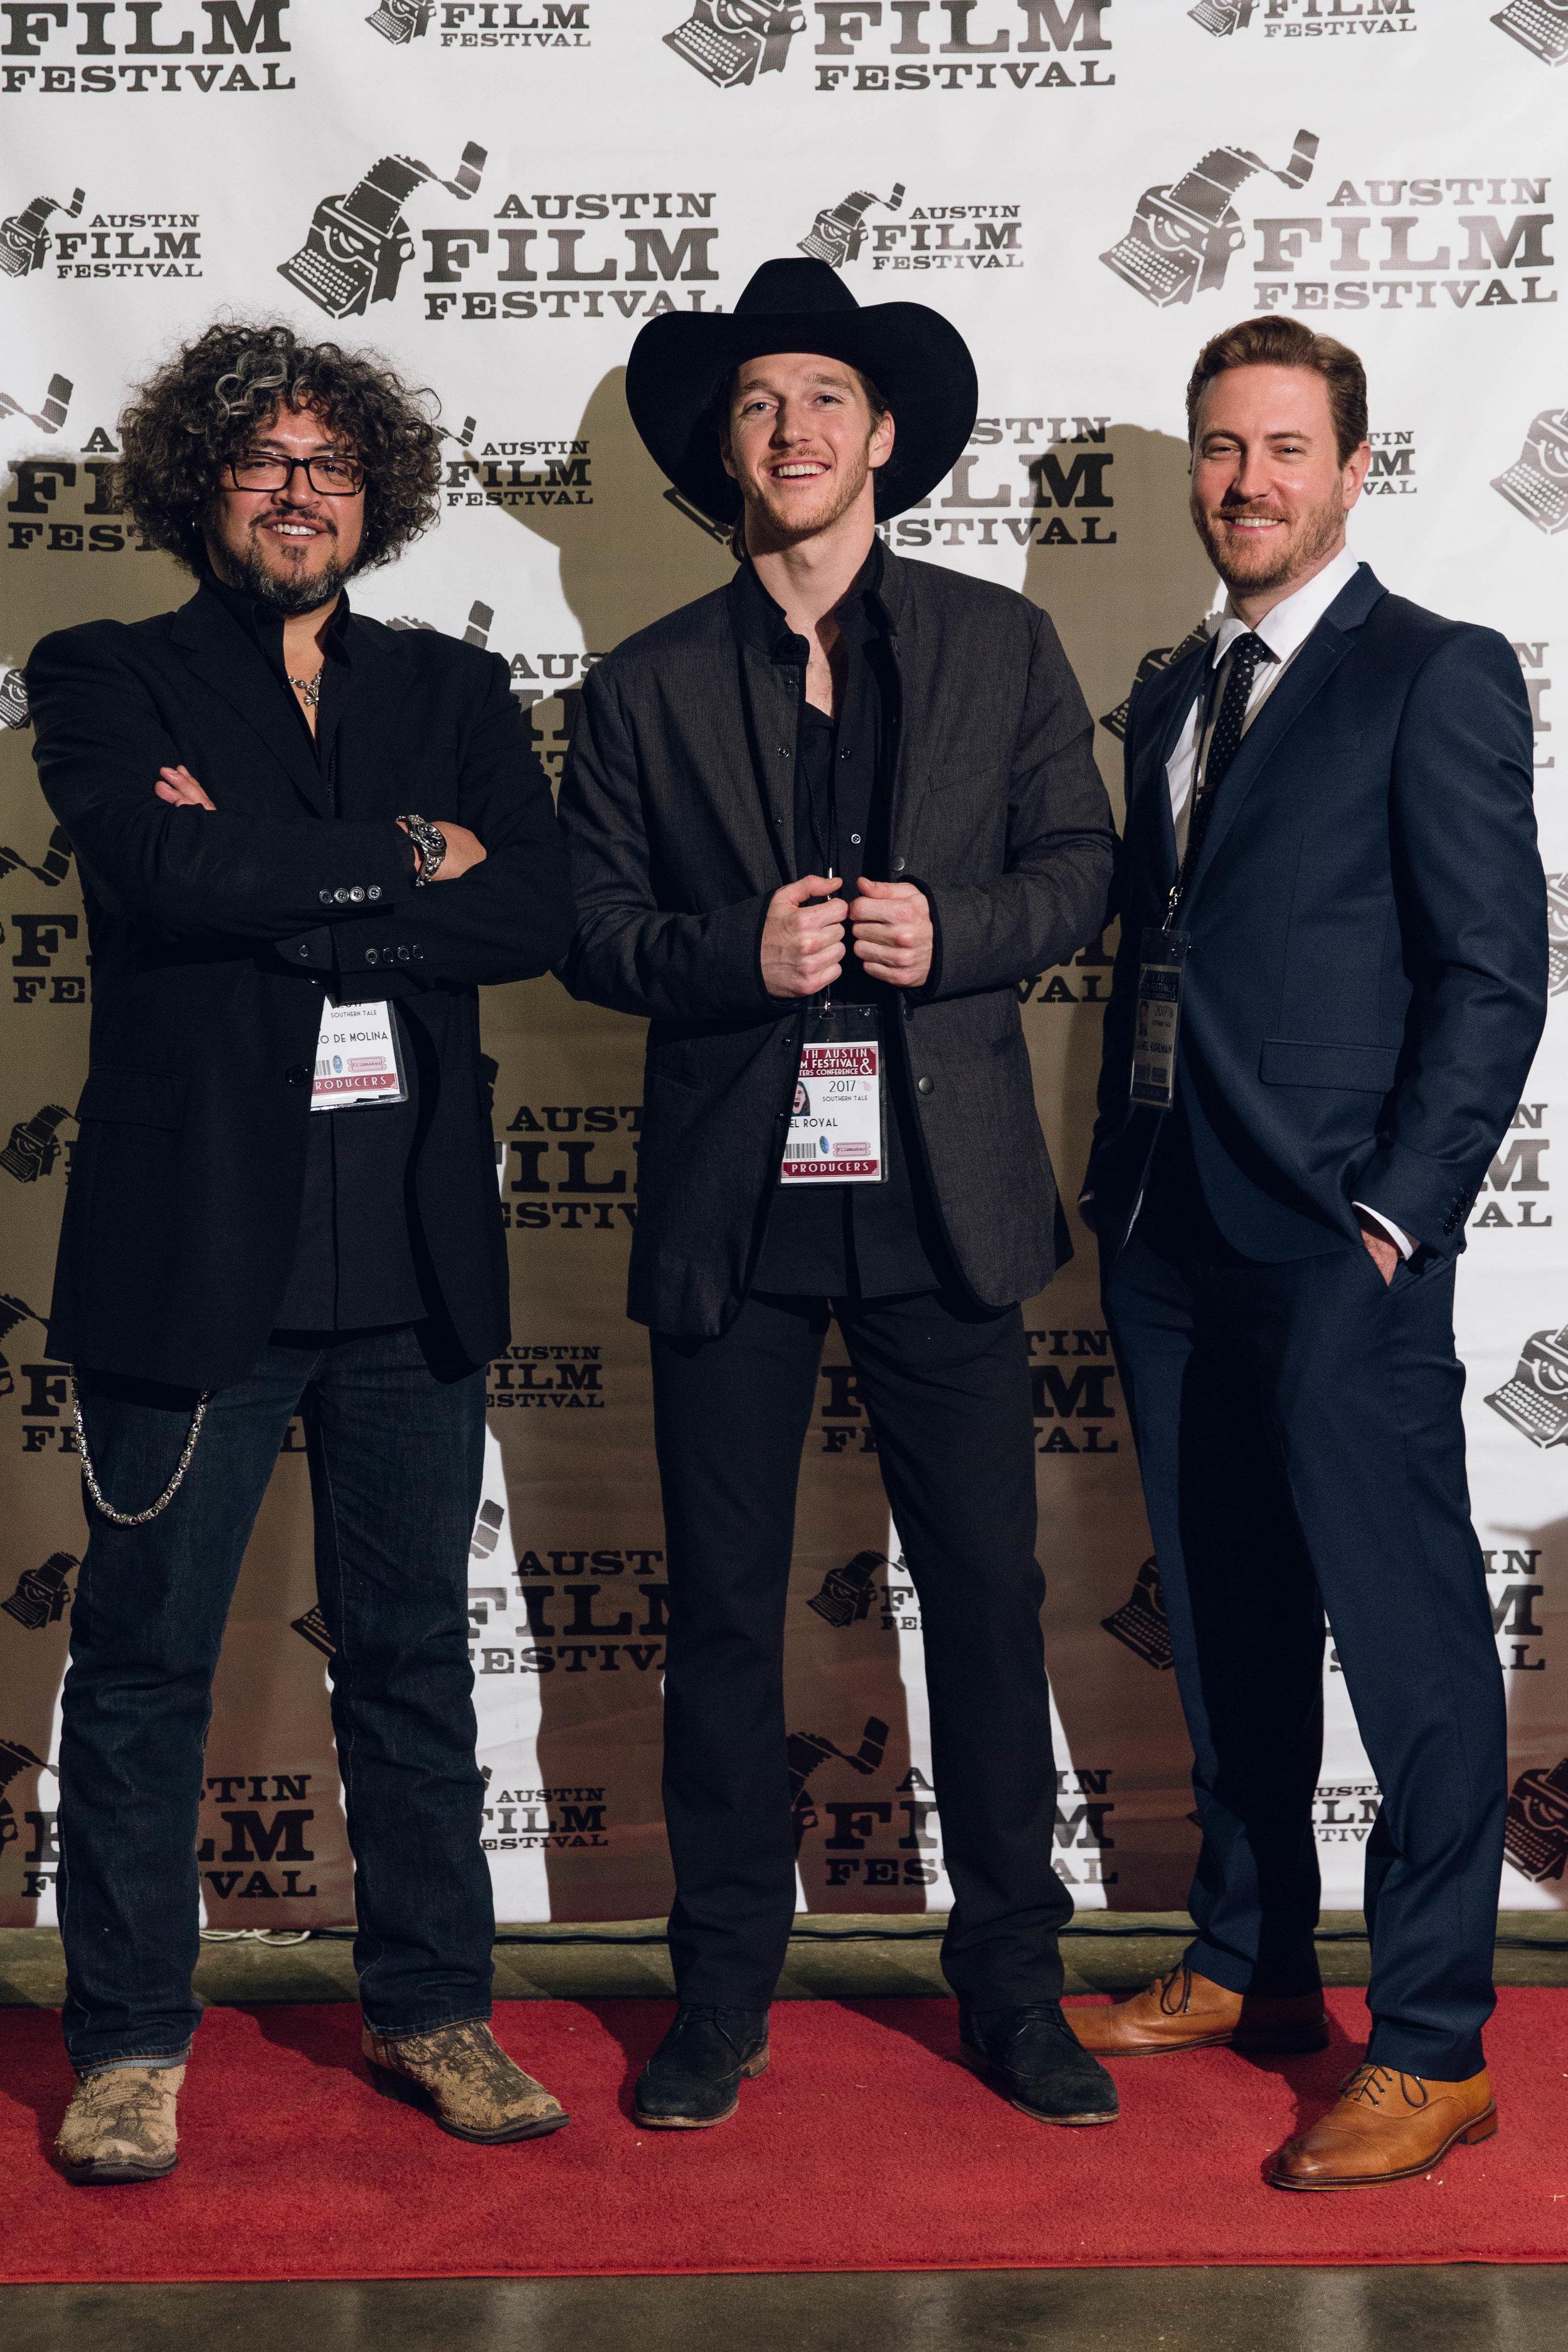 Southern-Tale-Austin-Film-Fest-Kirby-Gladstein-2017-3028.jpg